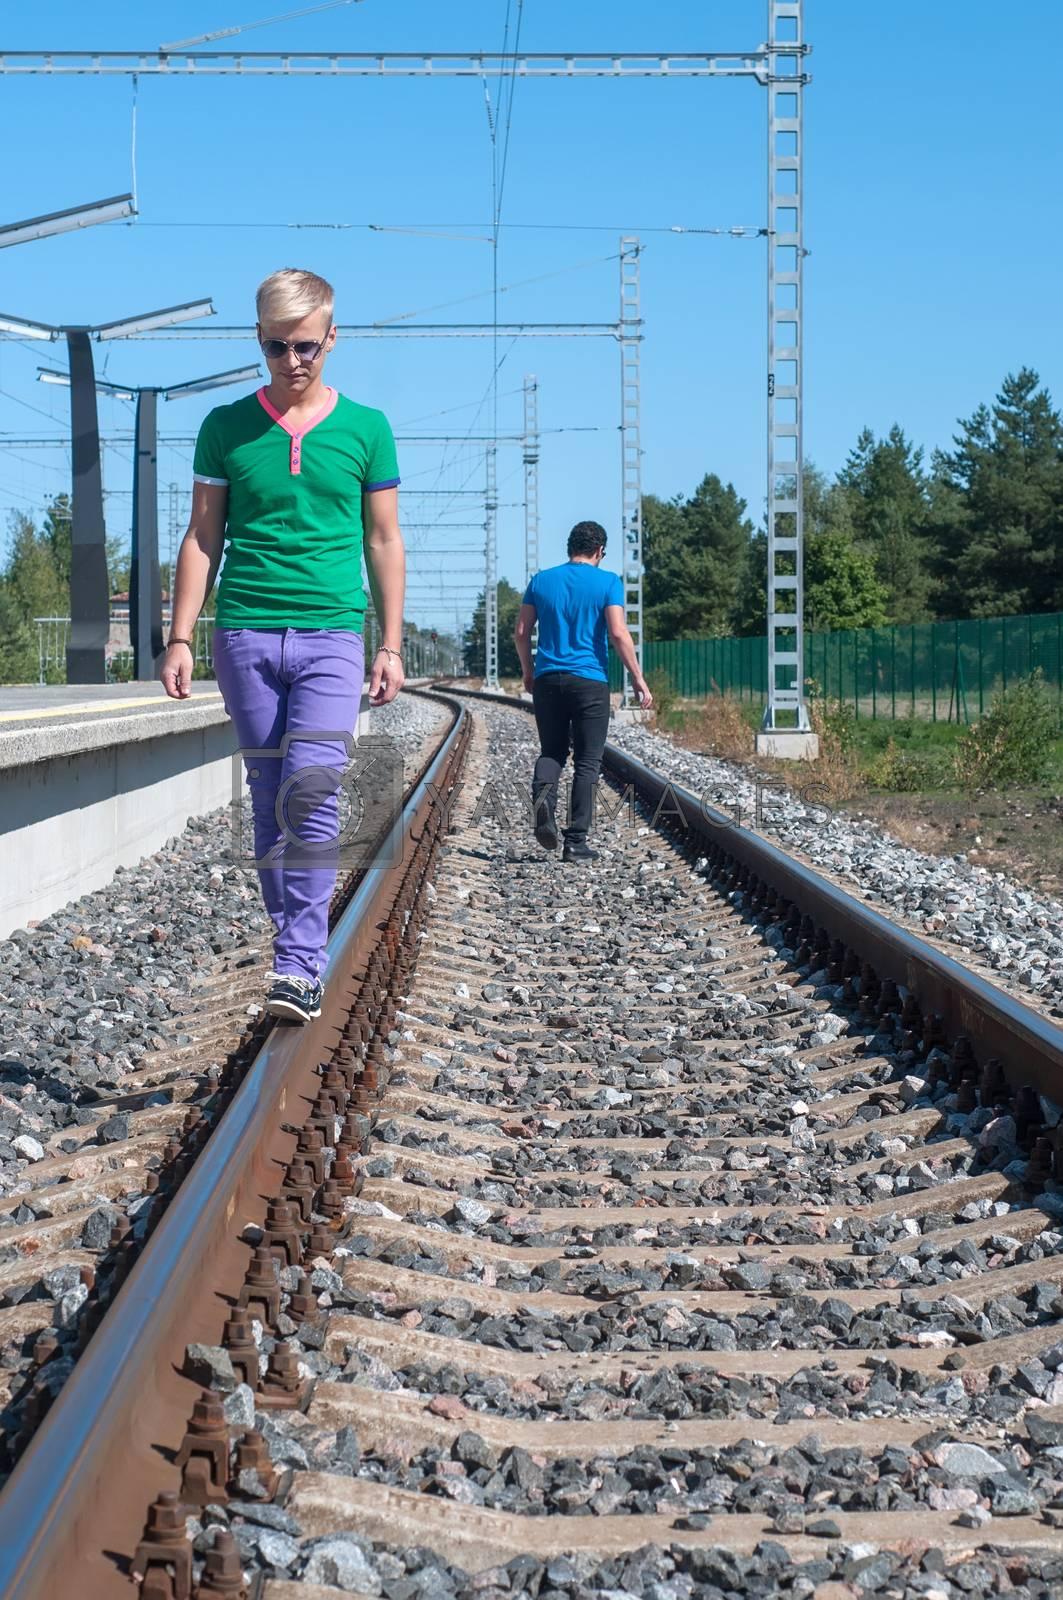 Shot of one man walking on train tracks